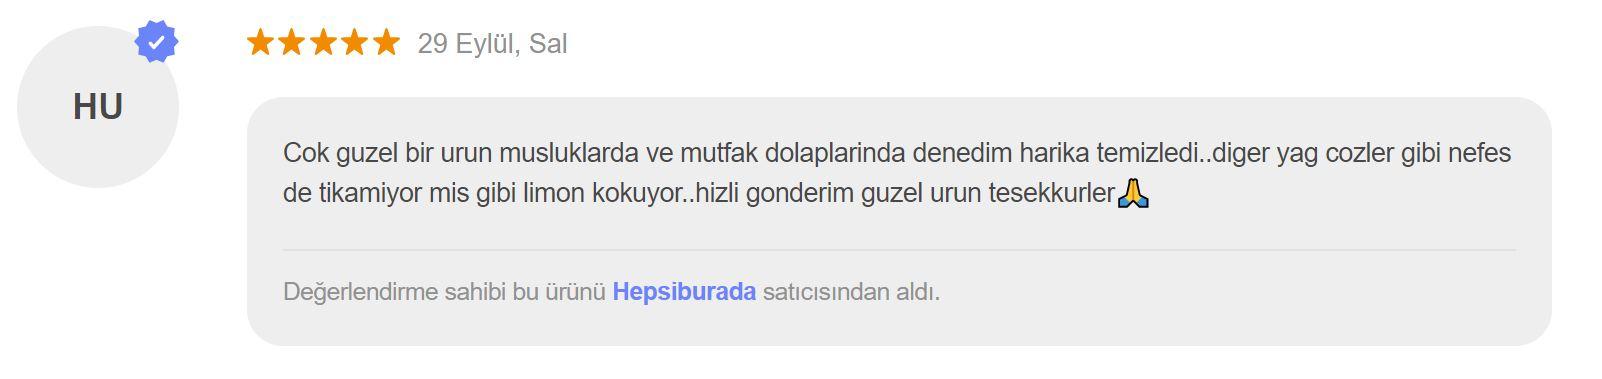 hepsiburada-yorum-2